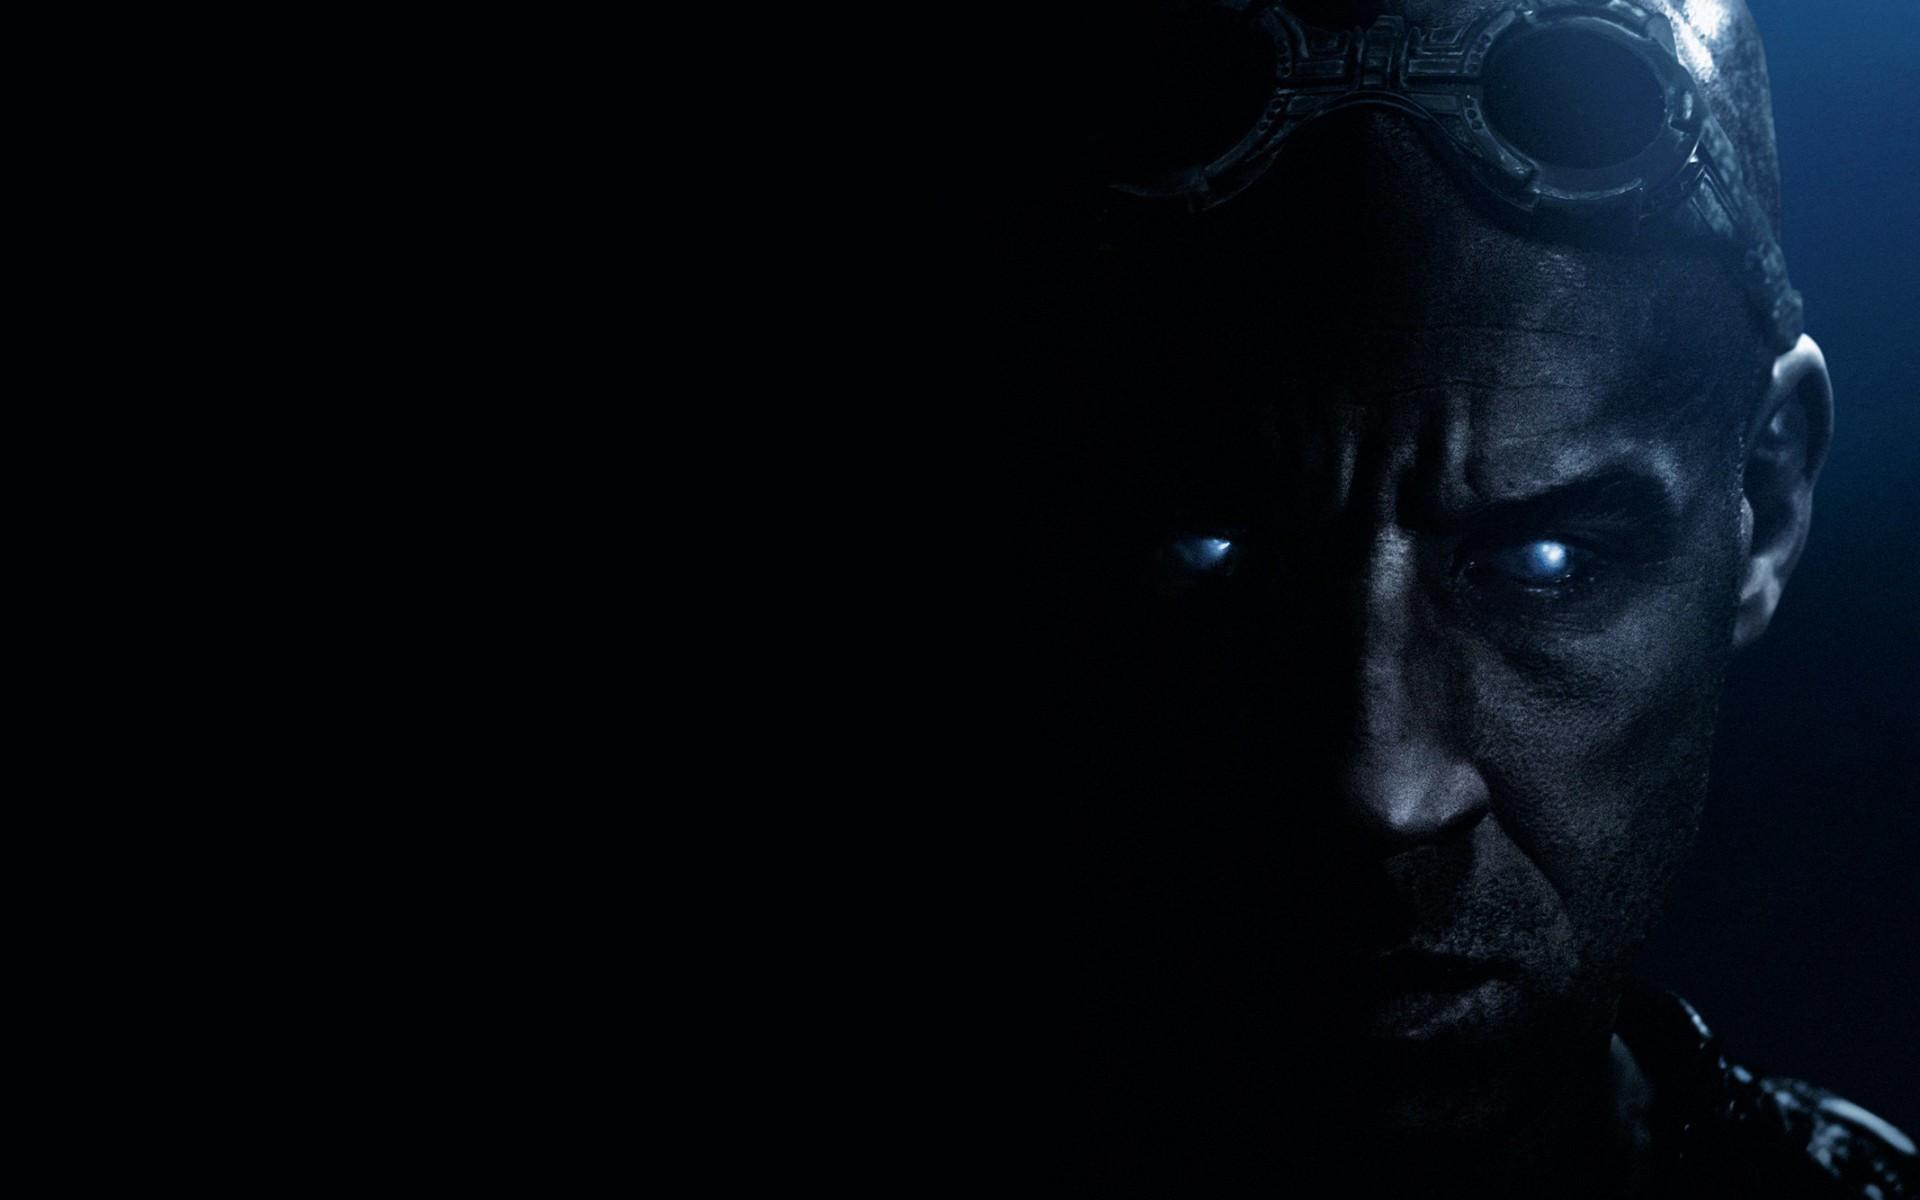 Riddick wallpaper 1